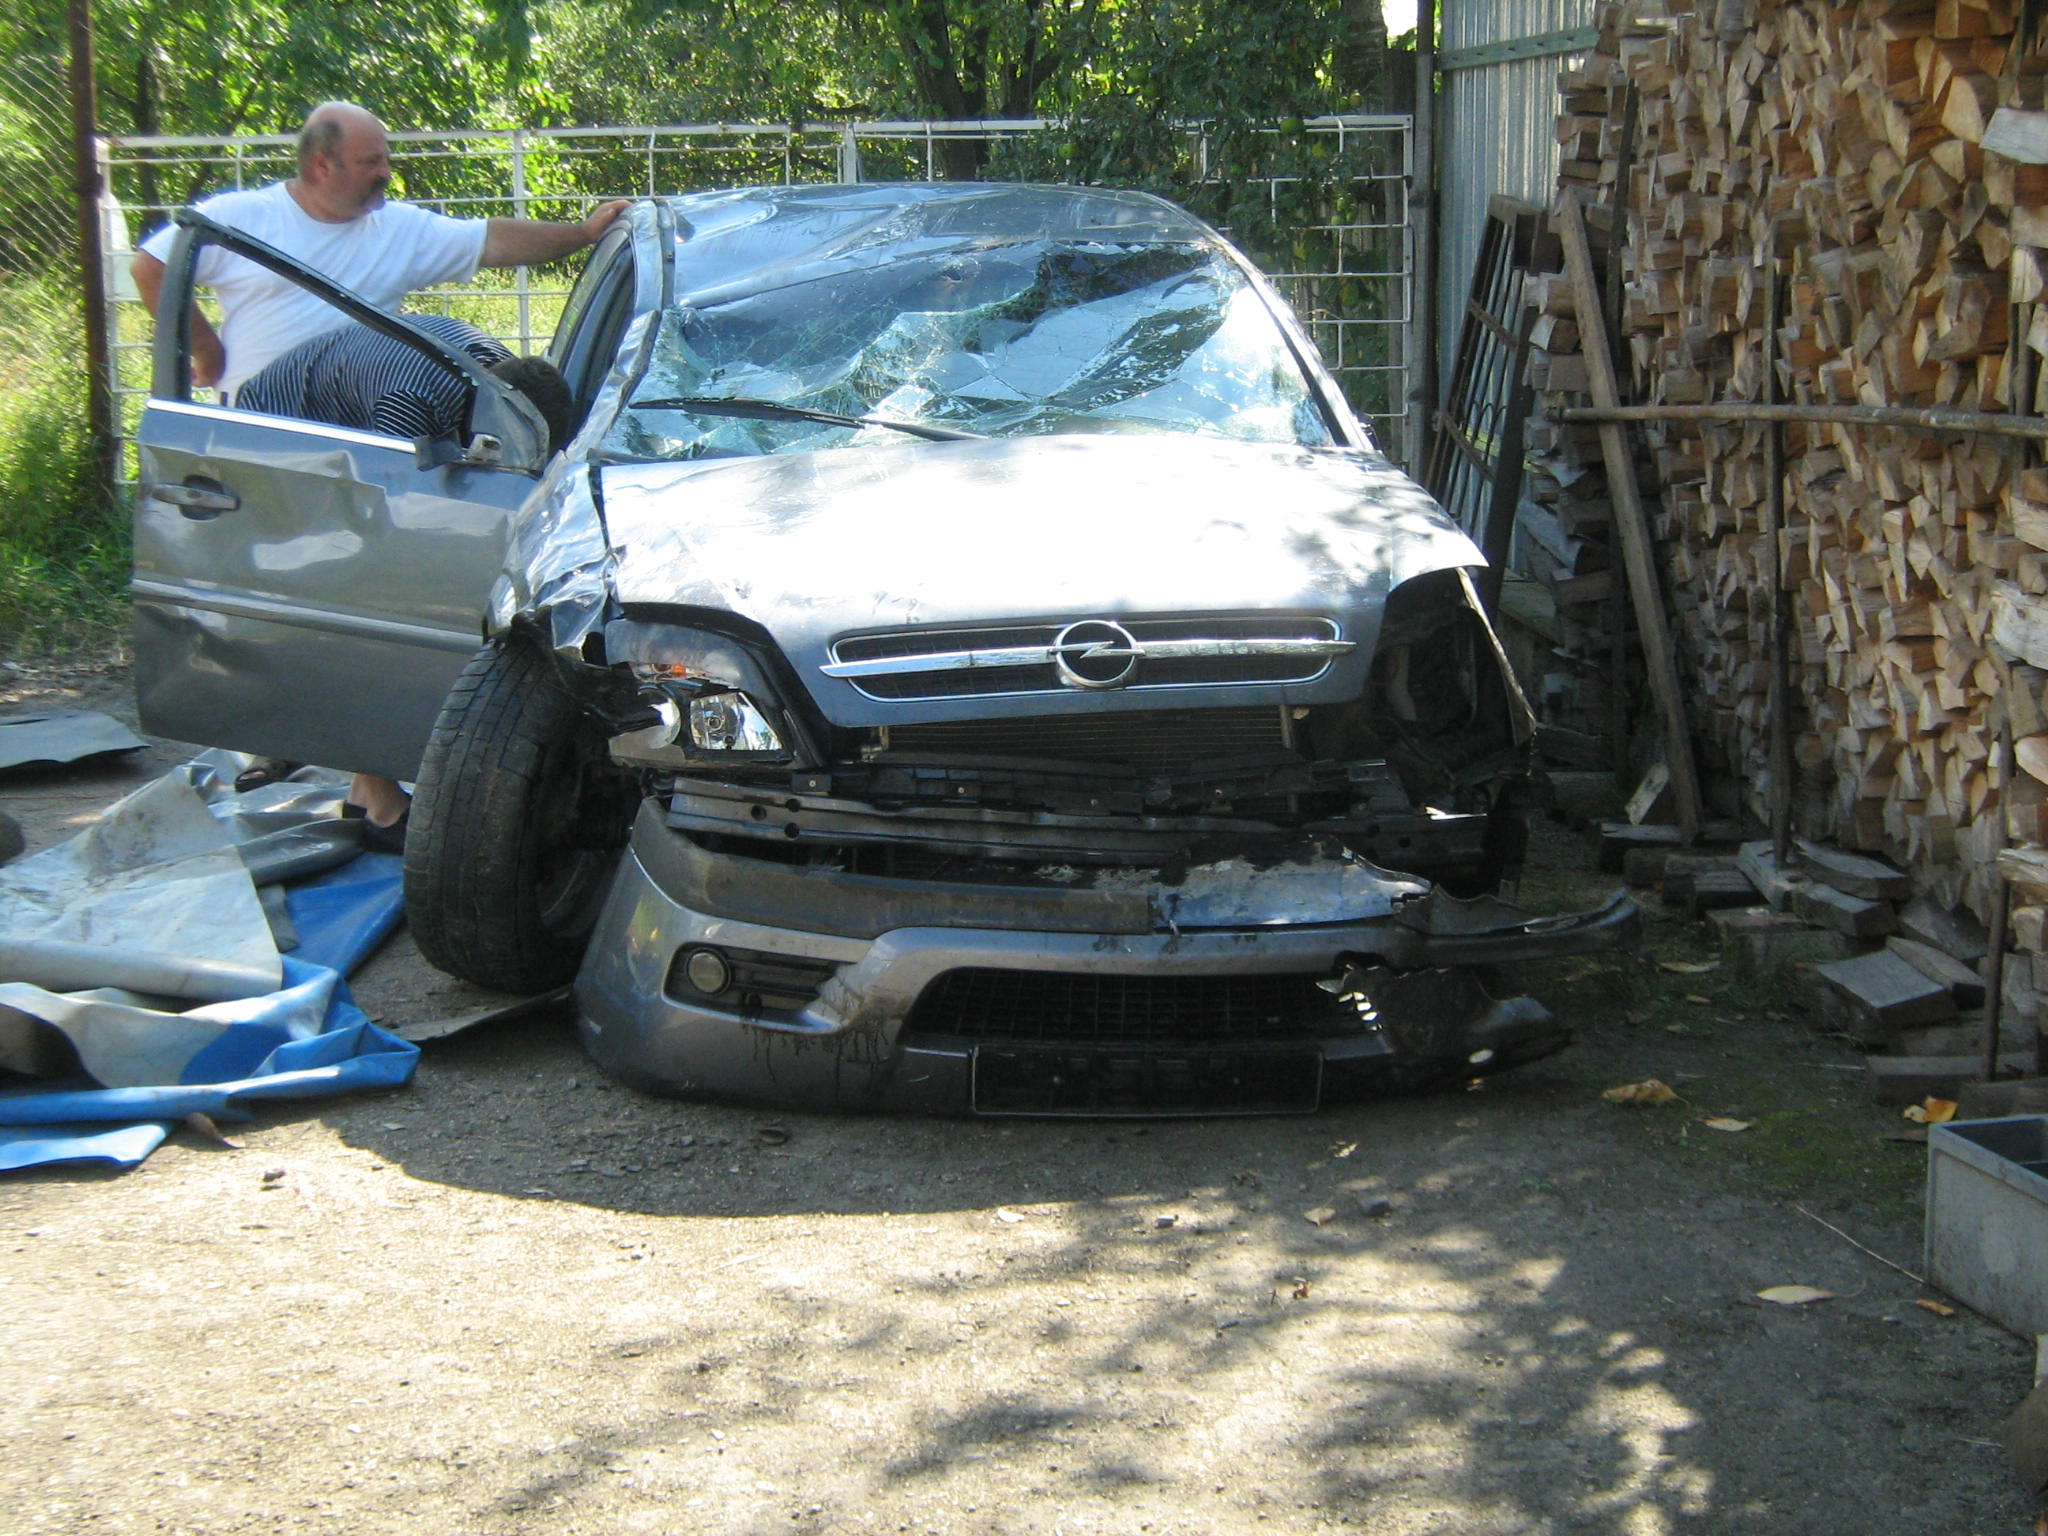 Opel Vectra avariat 2002 Diesel Hatchback - 30 Martie 2011 - Poza 5